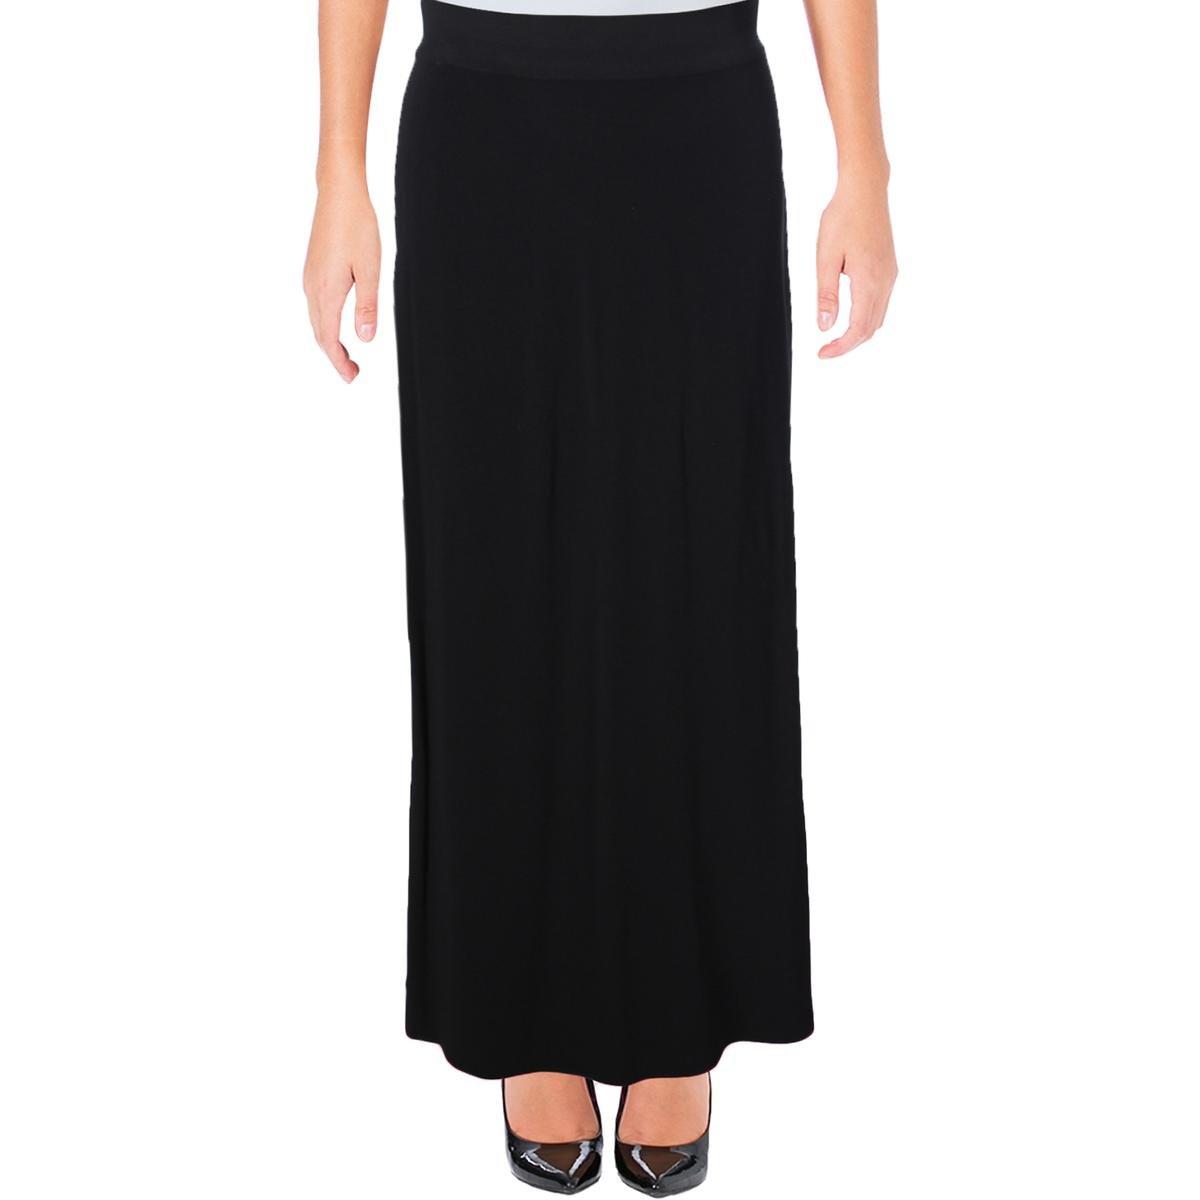 Helmut Lang Womens Crepe Comfort Waist Maxi Skirt Black XS by Helmut Lang